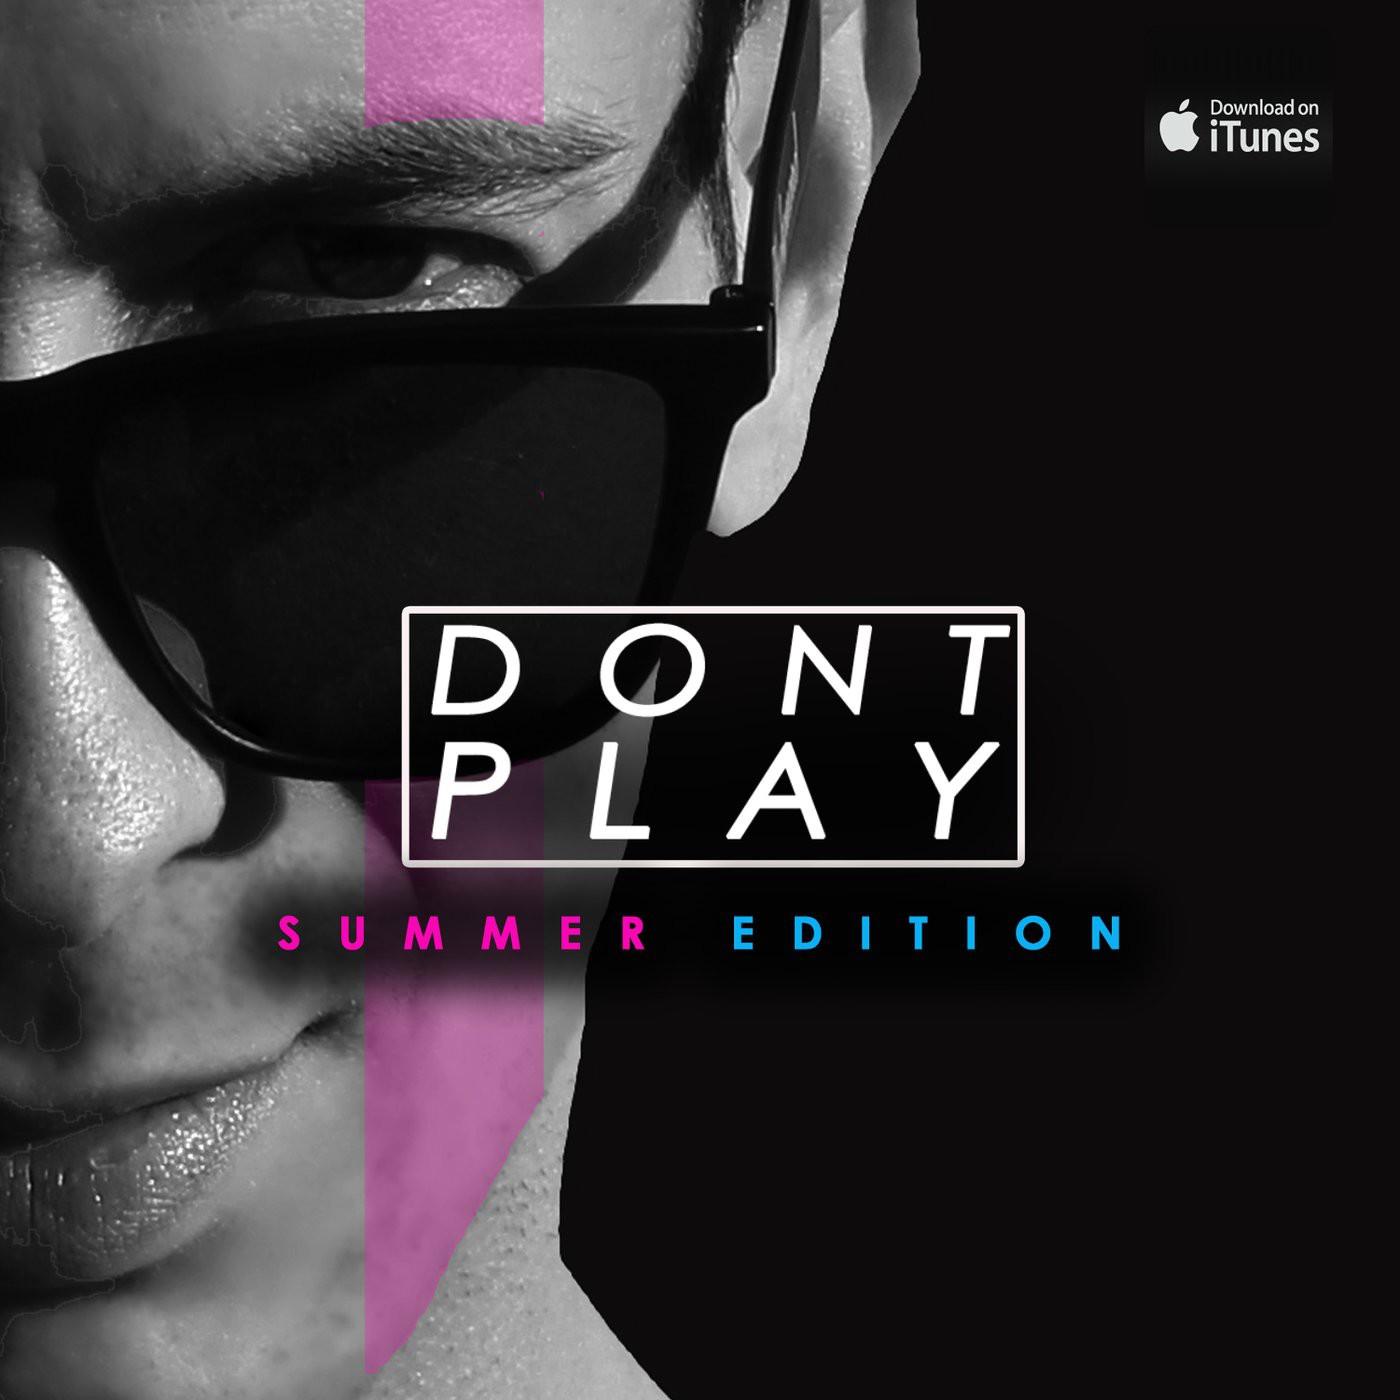 <![CDATA[David Garro @ Dont Play Summer Edition]]>